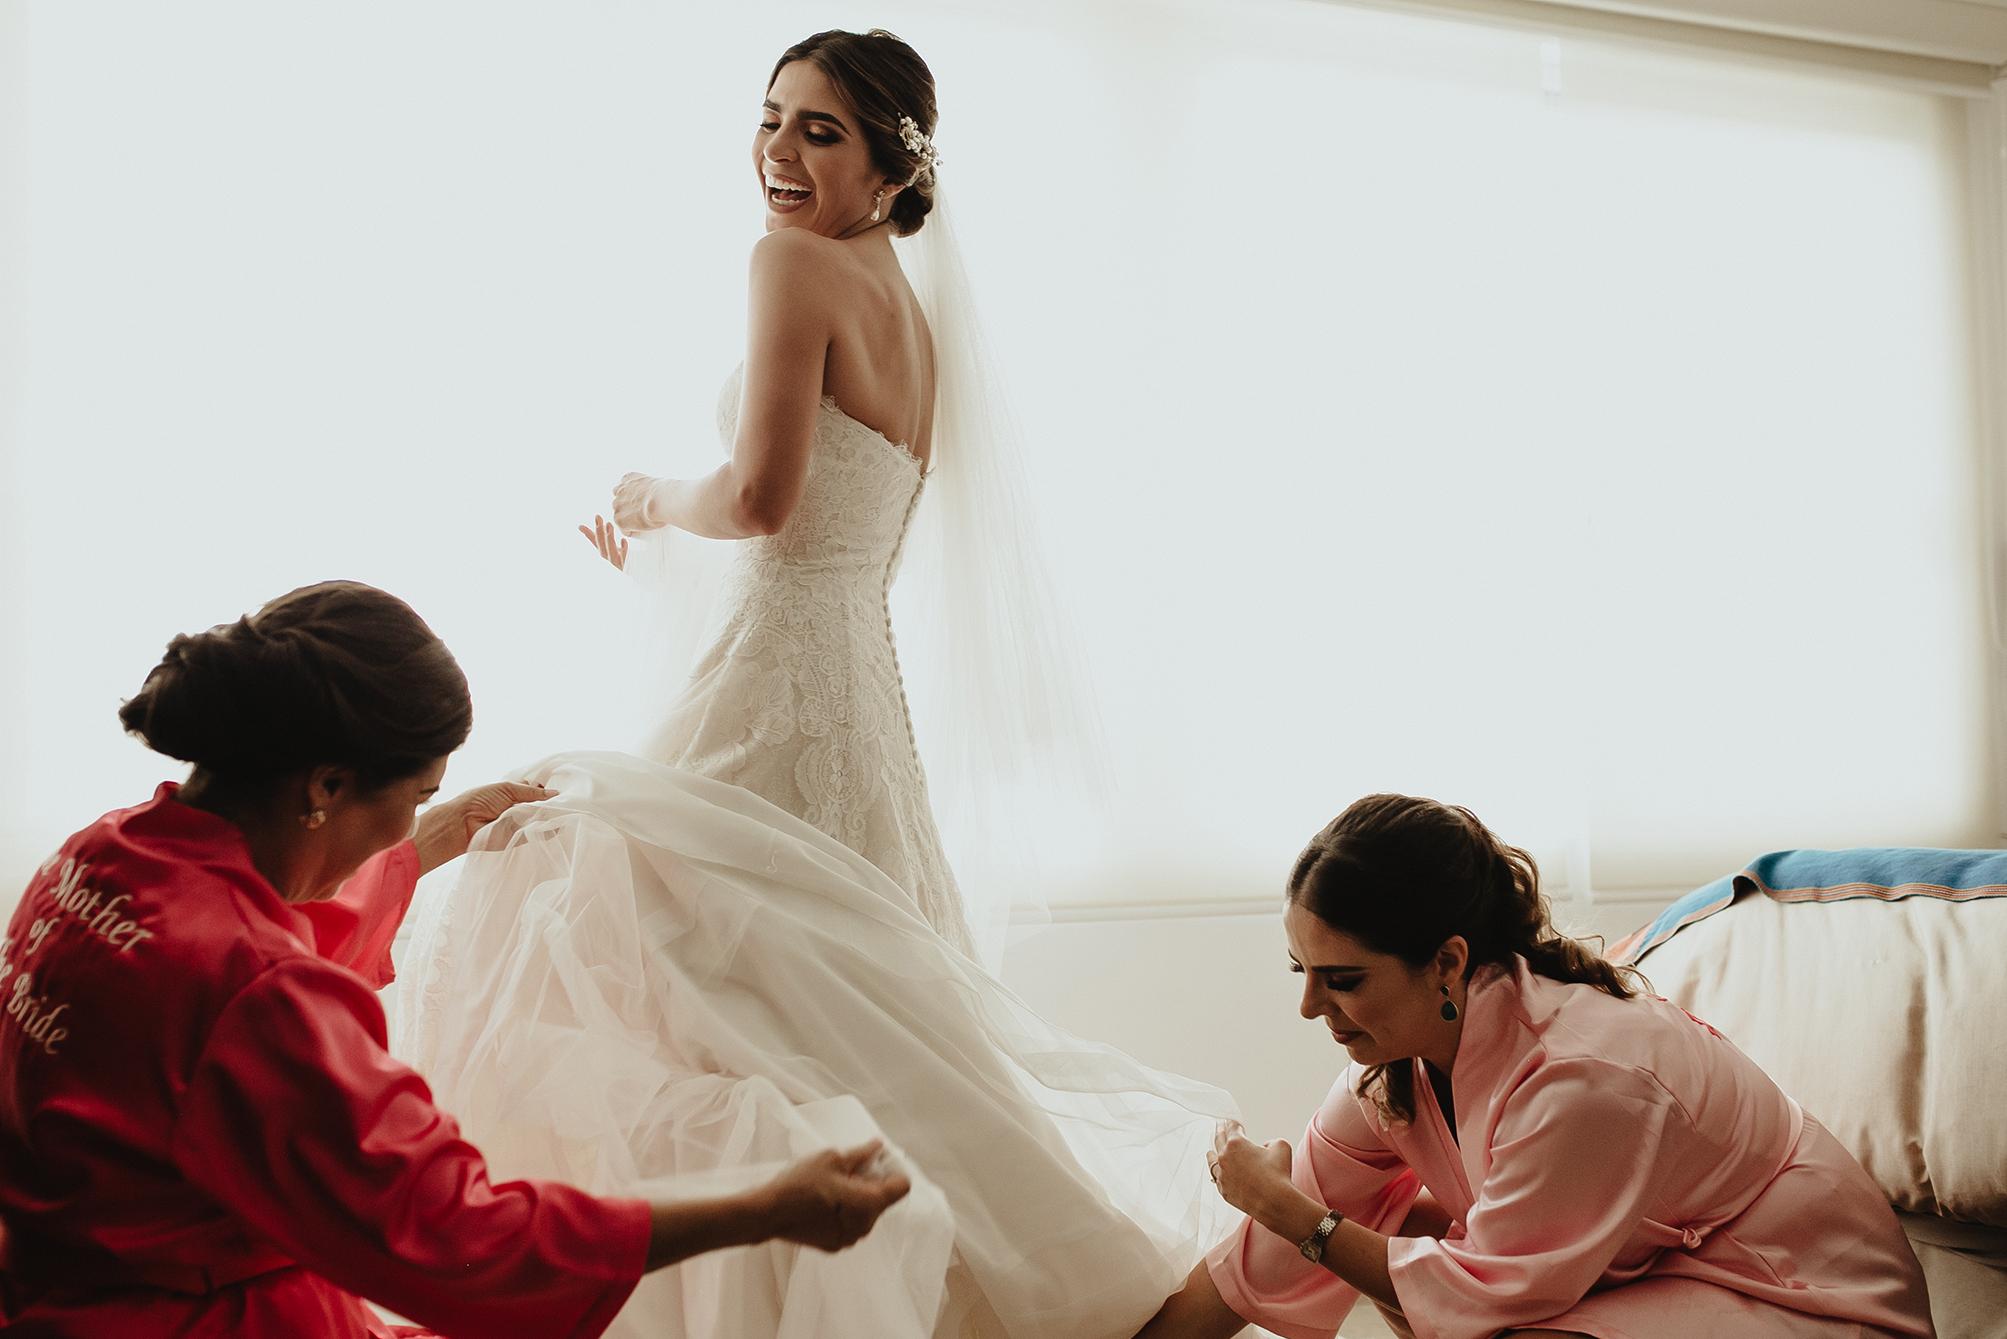 0099F&Yslide_WeddingDstination_MeridaYucatan_HaciendasMerida_BodasMexico_BodasYucatan_Boda_Destino.jpg